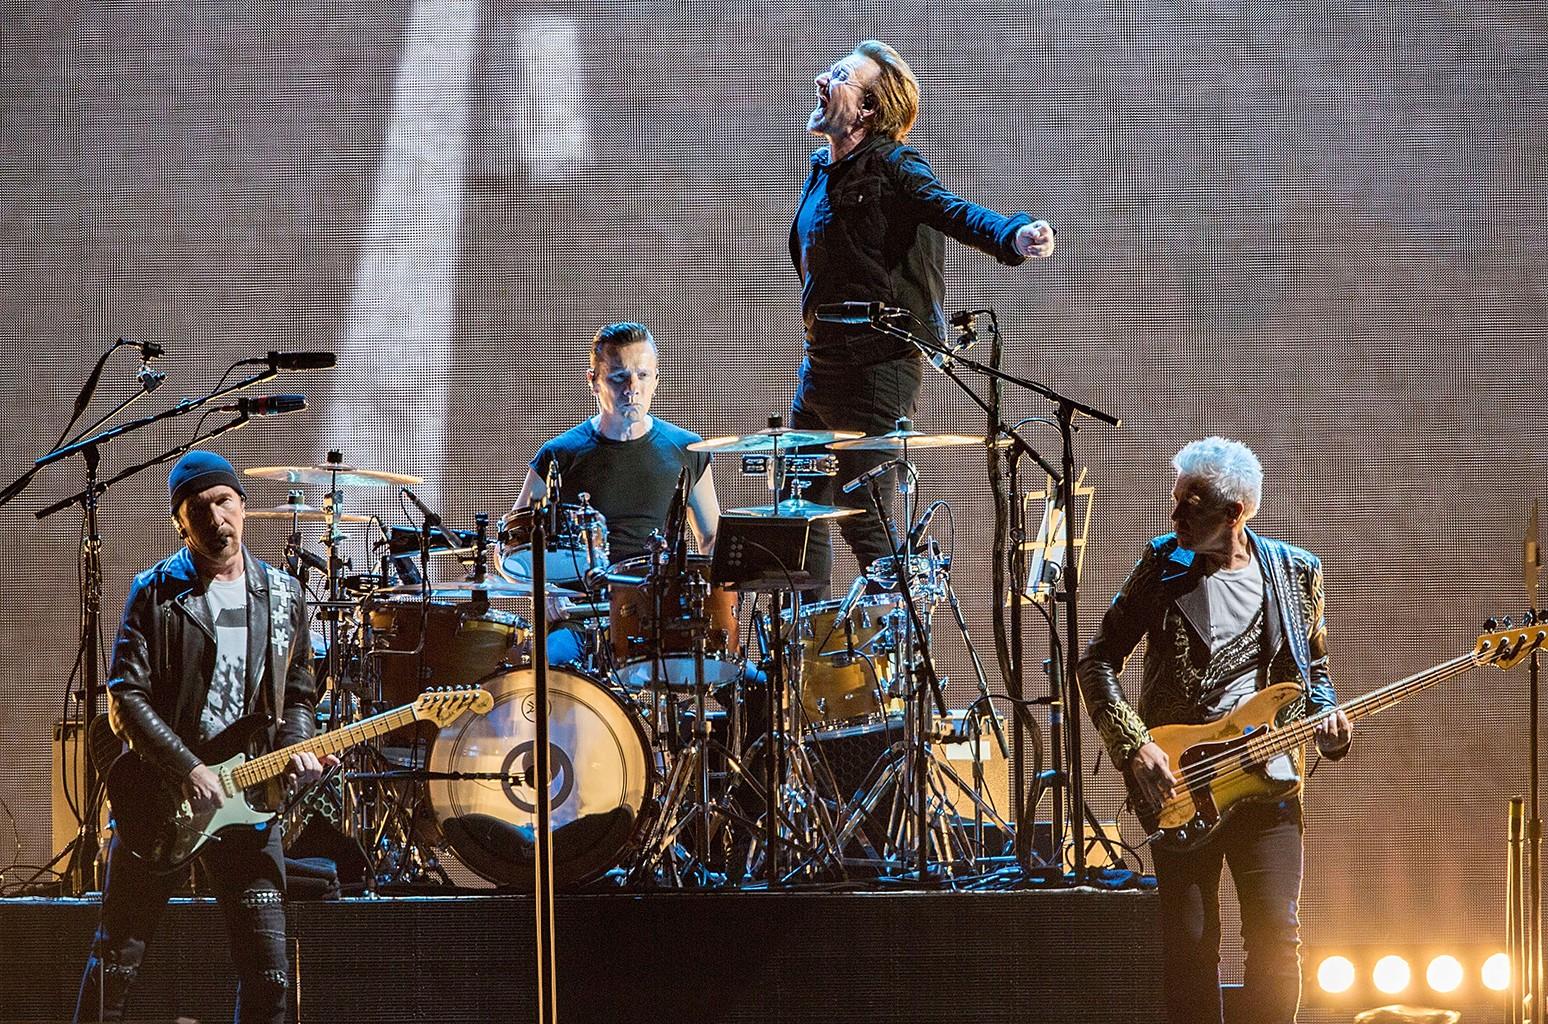 The Edge, Larry Mullen Jr., Bono, and Adam Clayton of U2